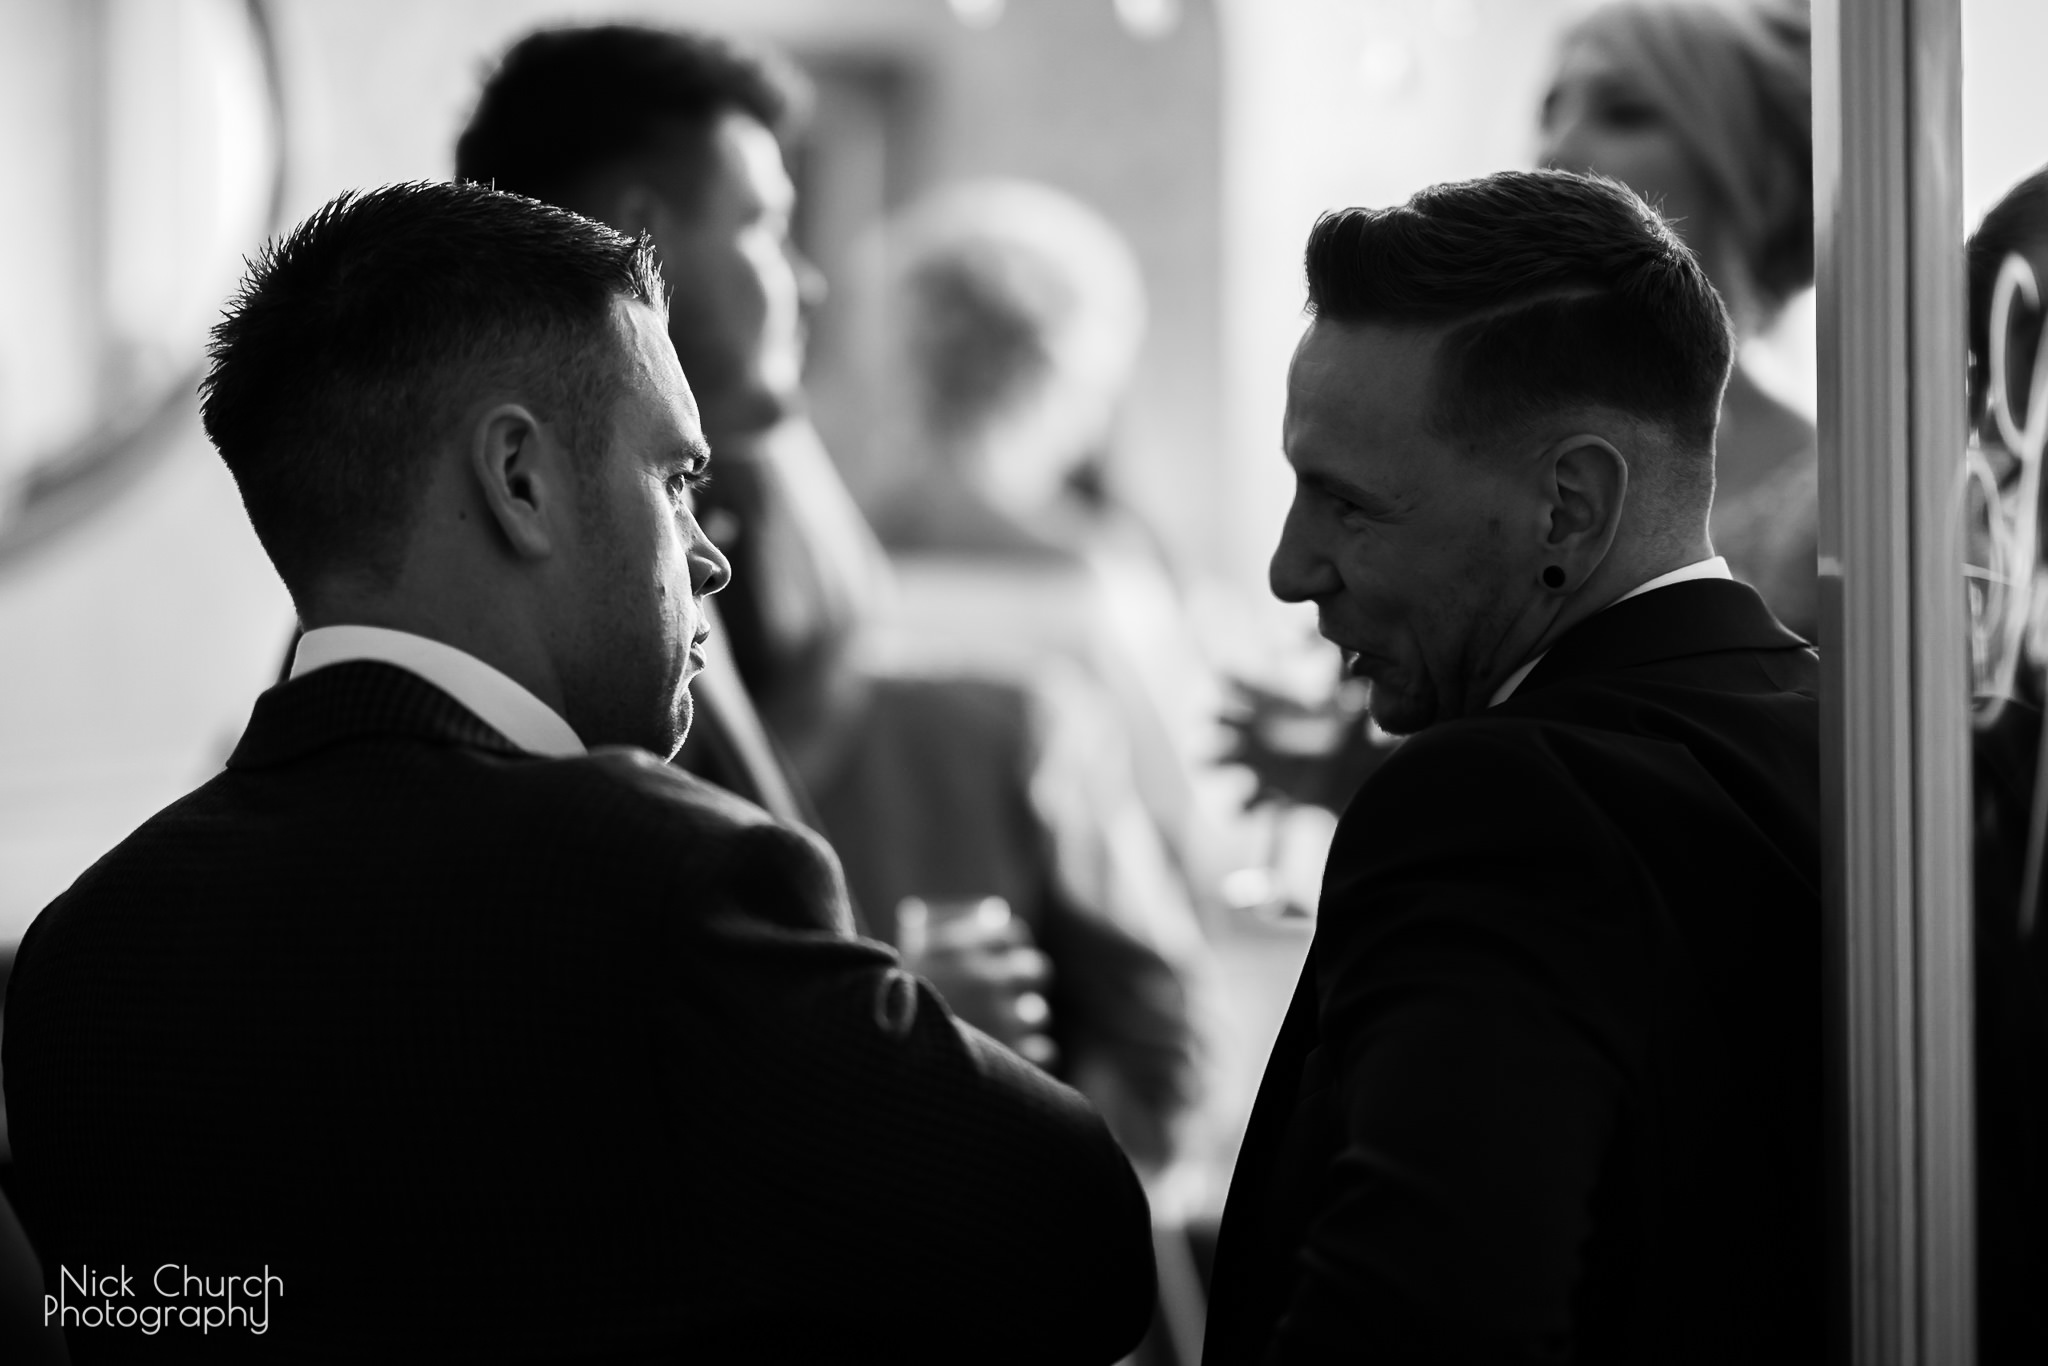 NC-20180317-stacy-and-mike-wedding-0819.jpg